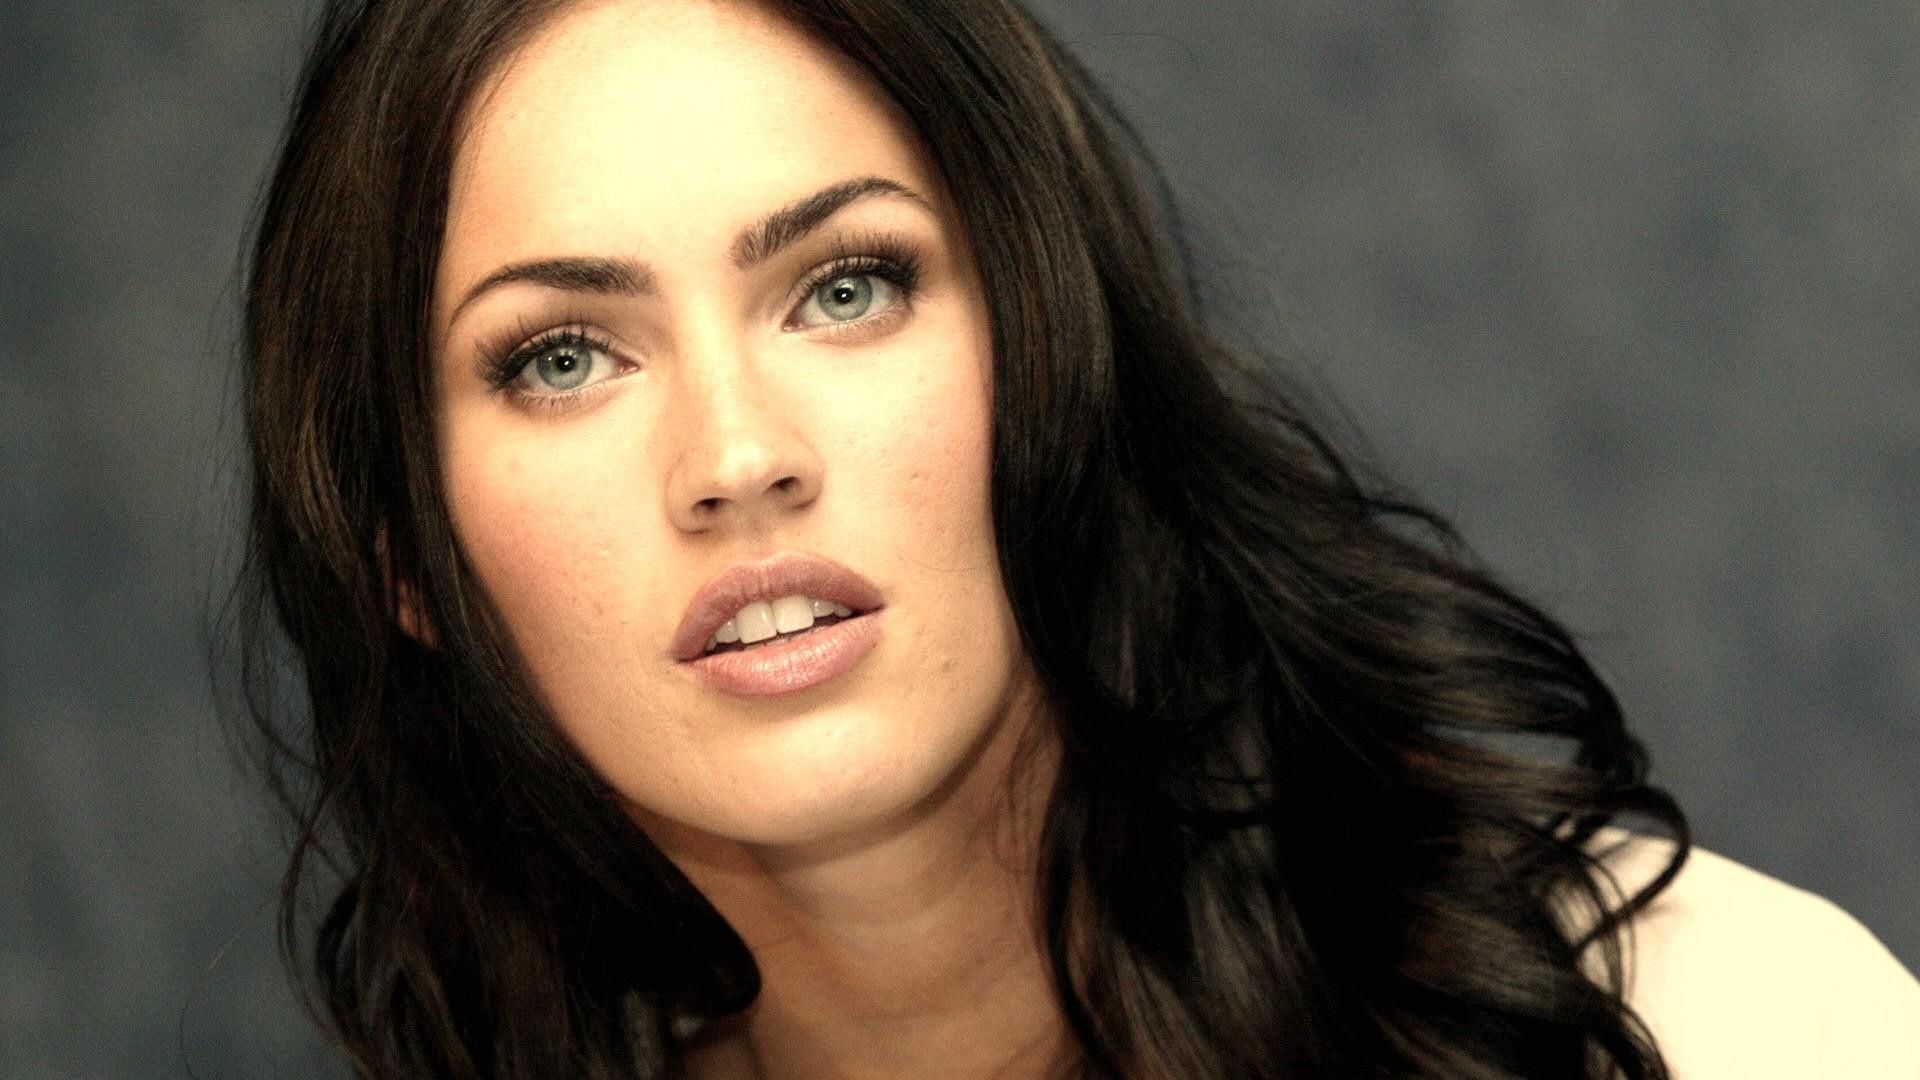 Megan Fox Close Up Picture 1080p HD Wallpaper Girls Celebrities 1920x1080